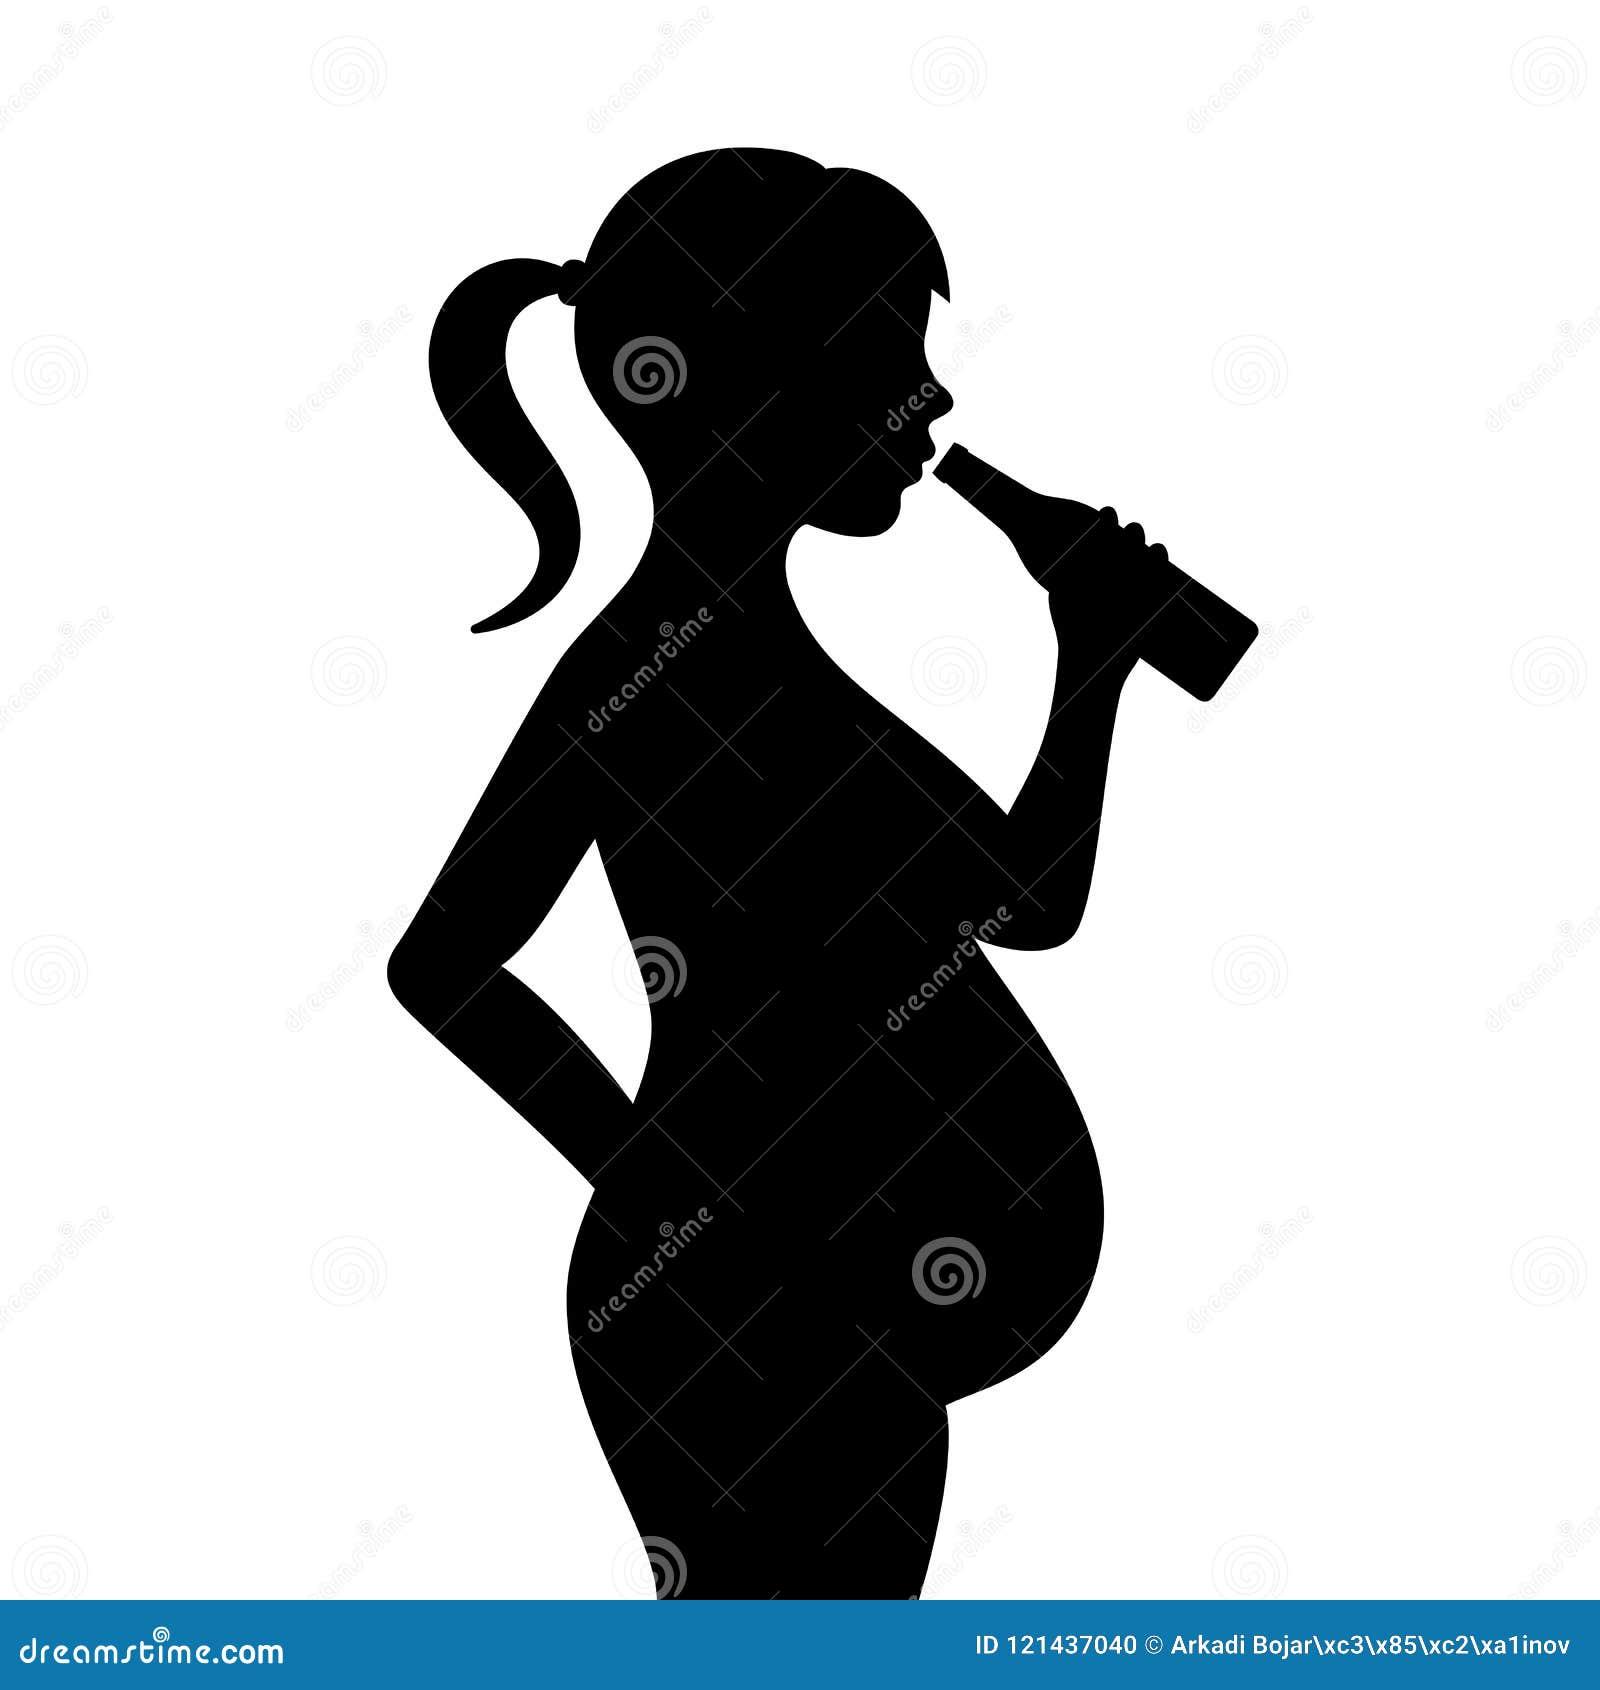 girl drinking alcohol stock illustrations � 701 girl